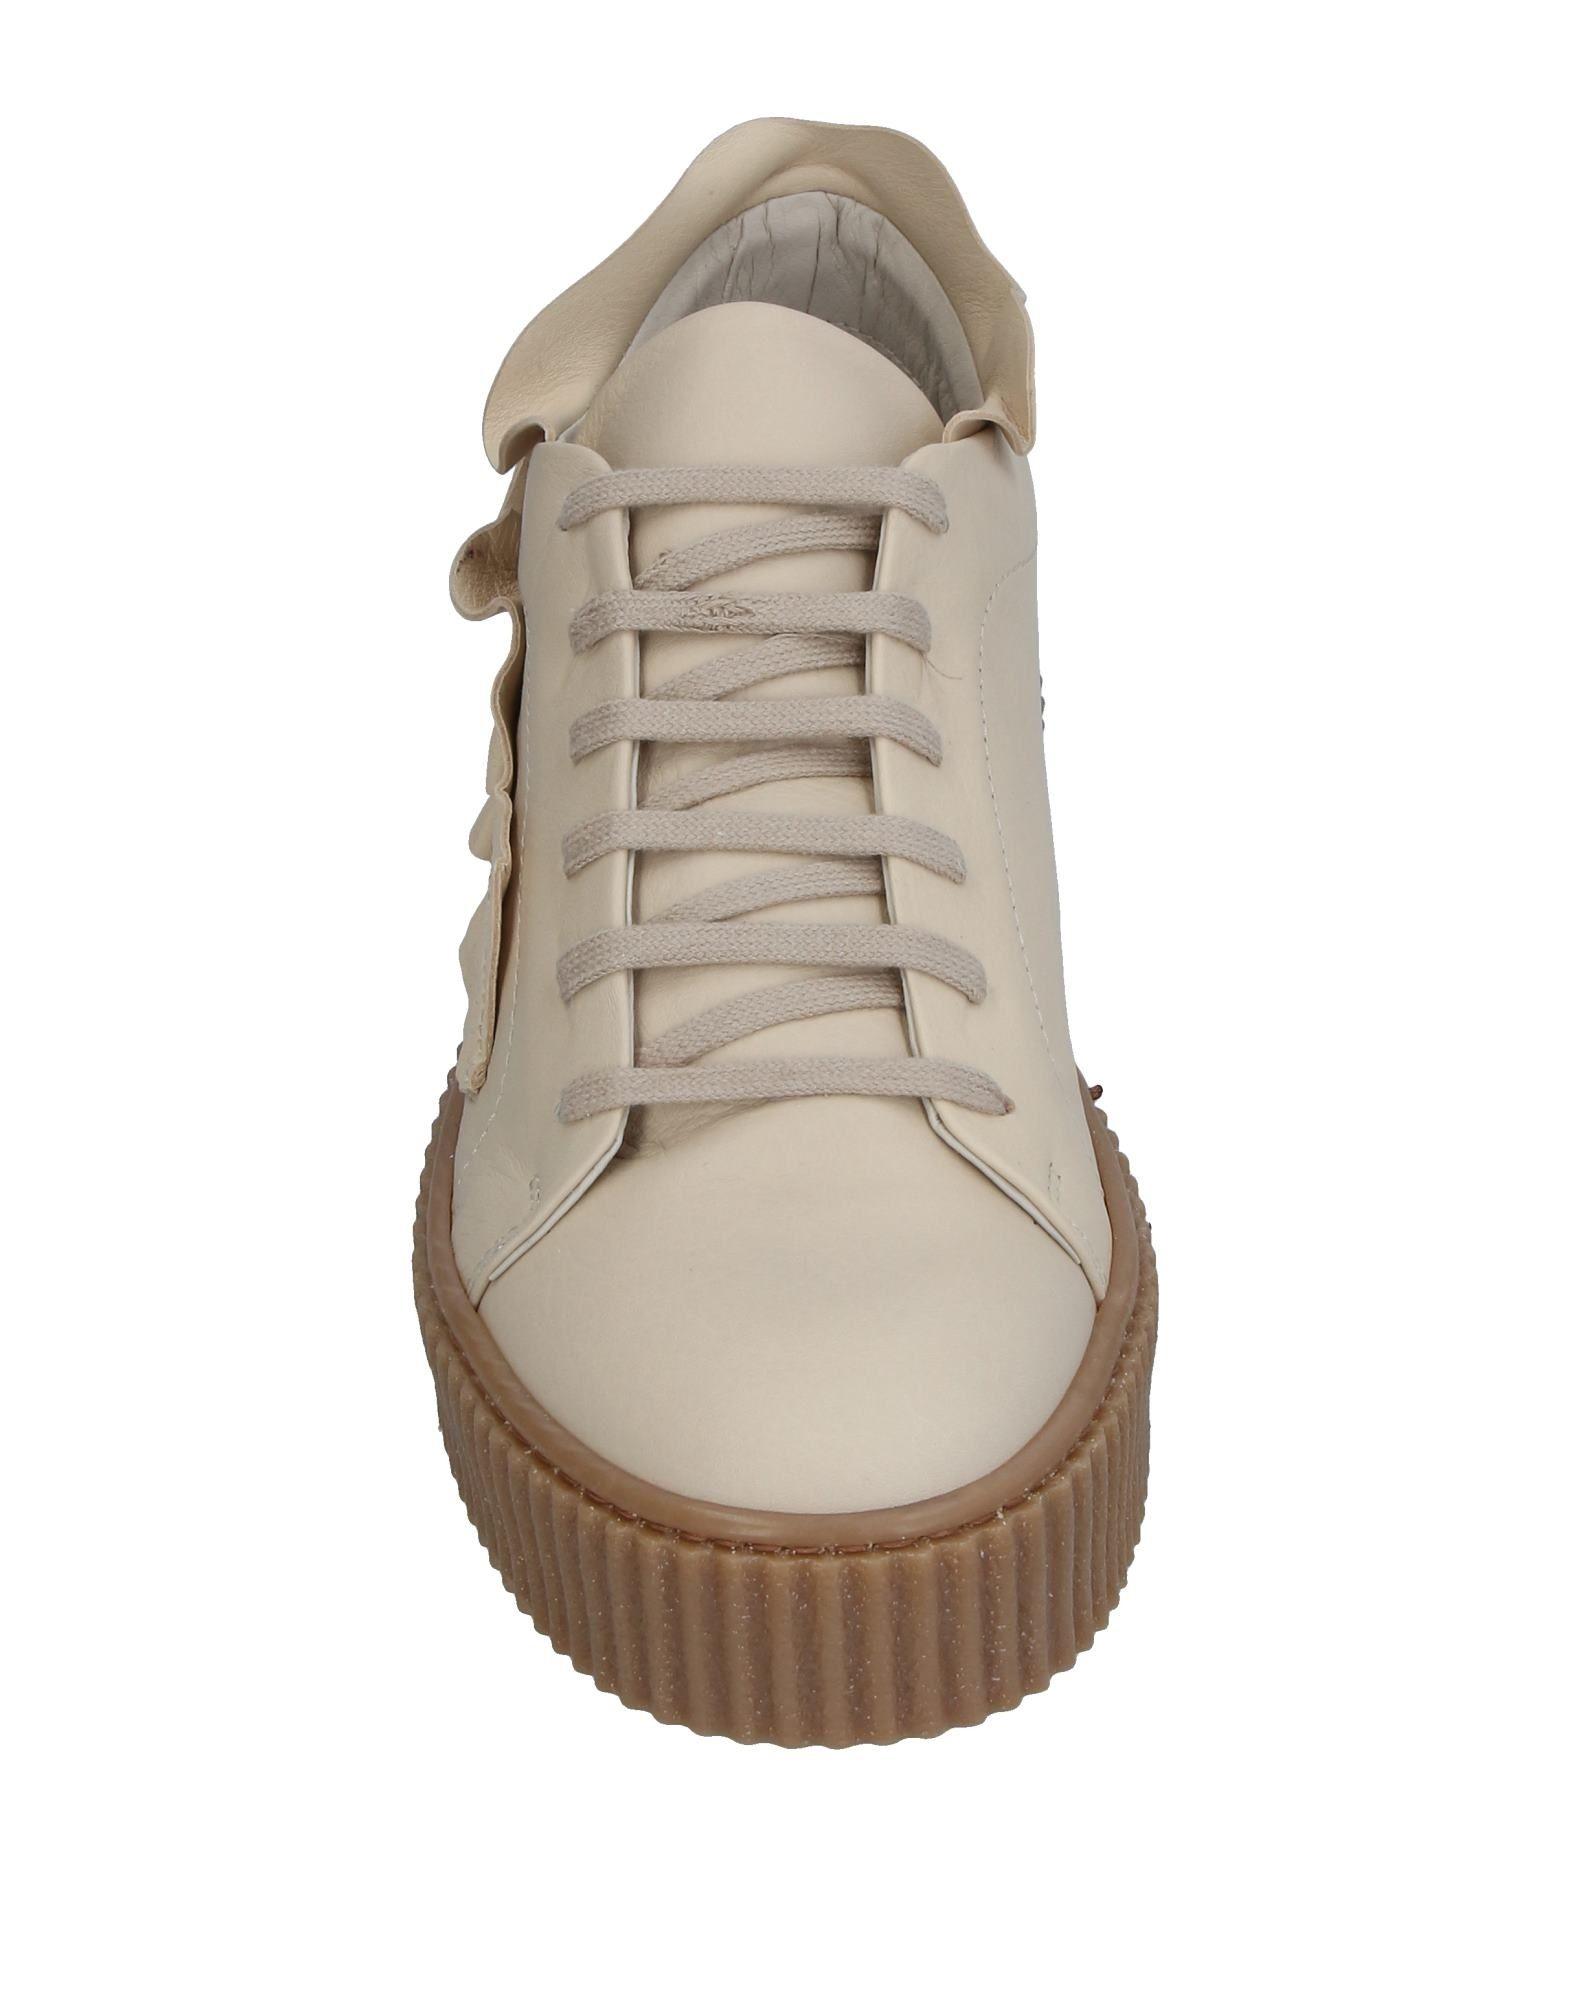 Ovye' By Cristina Lucchi Sneakers Damen  11336159LE Gute Qualität beliebte Schuhe